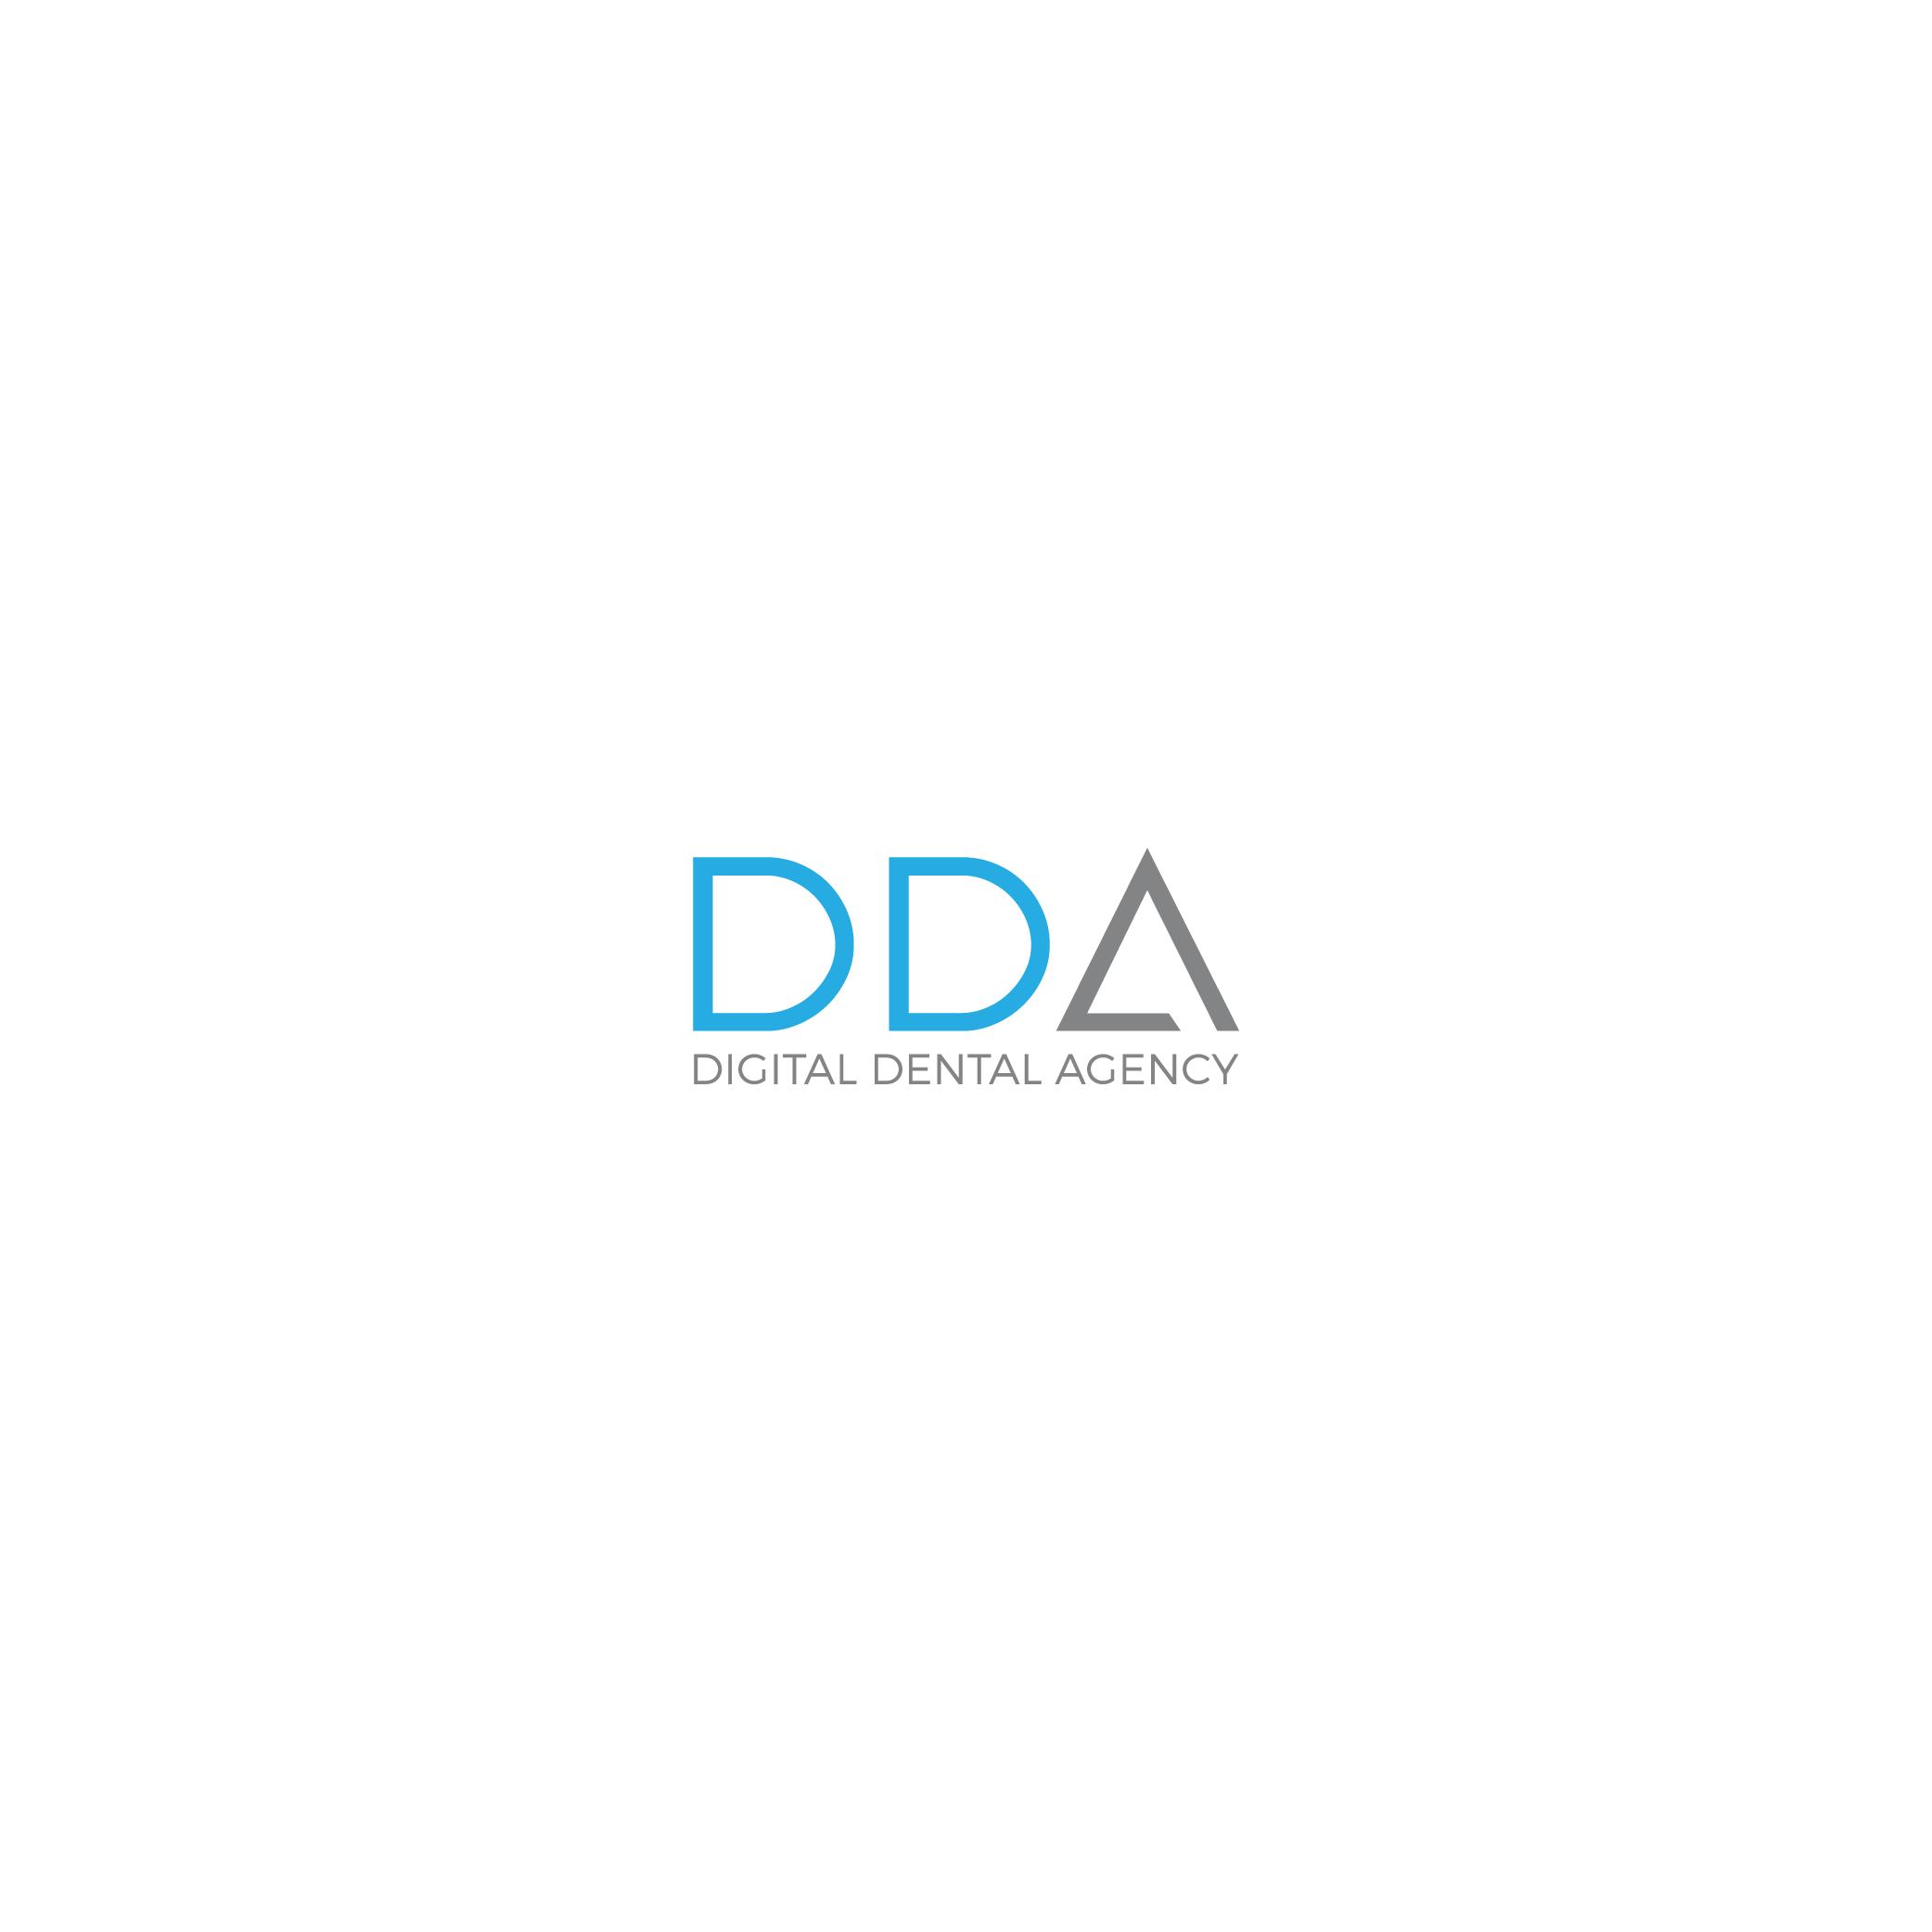 Logo Design by 354studio - Entry No. 20 in the Logo Design Contest Imaginative Logo Design for Digital Dental Agency.